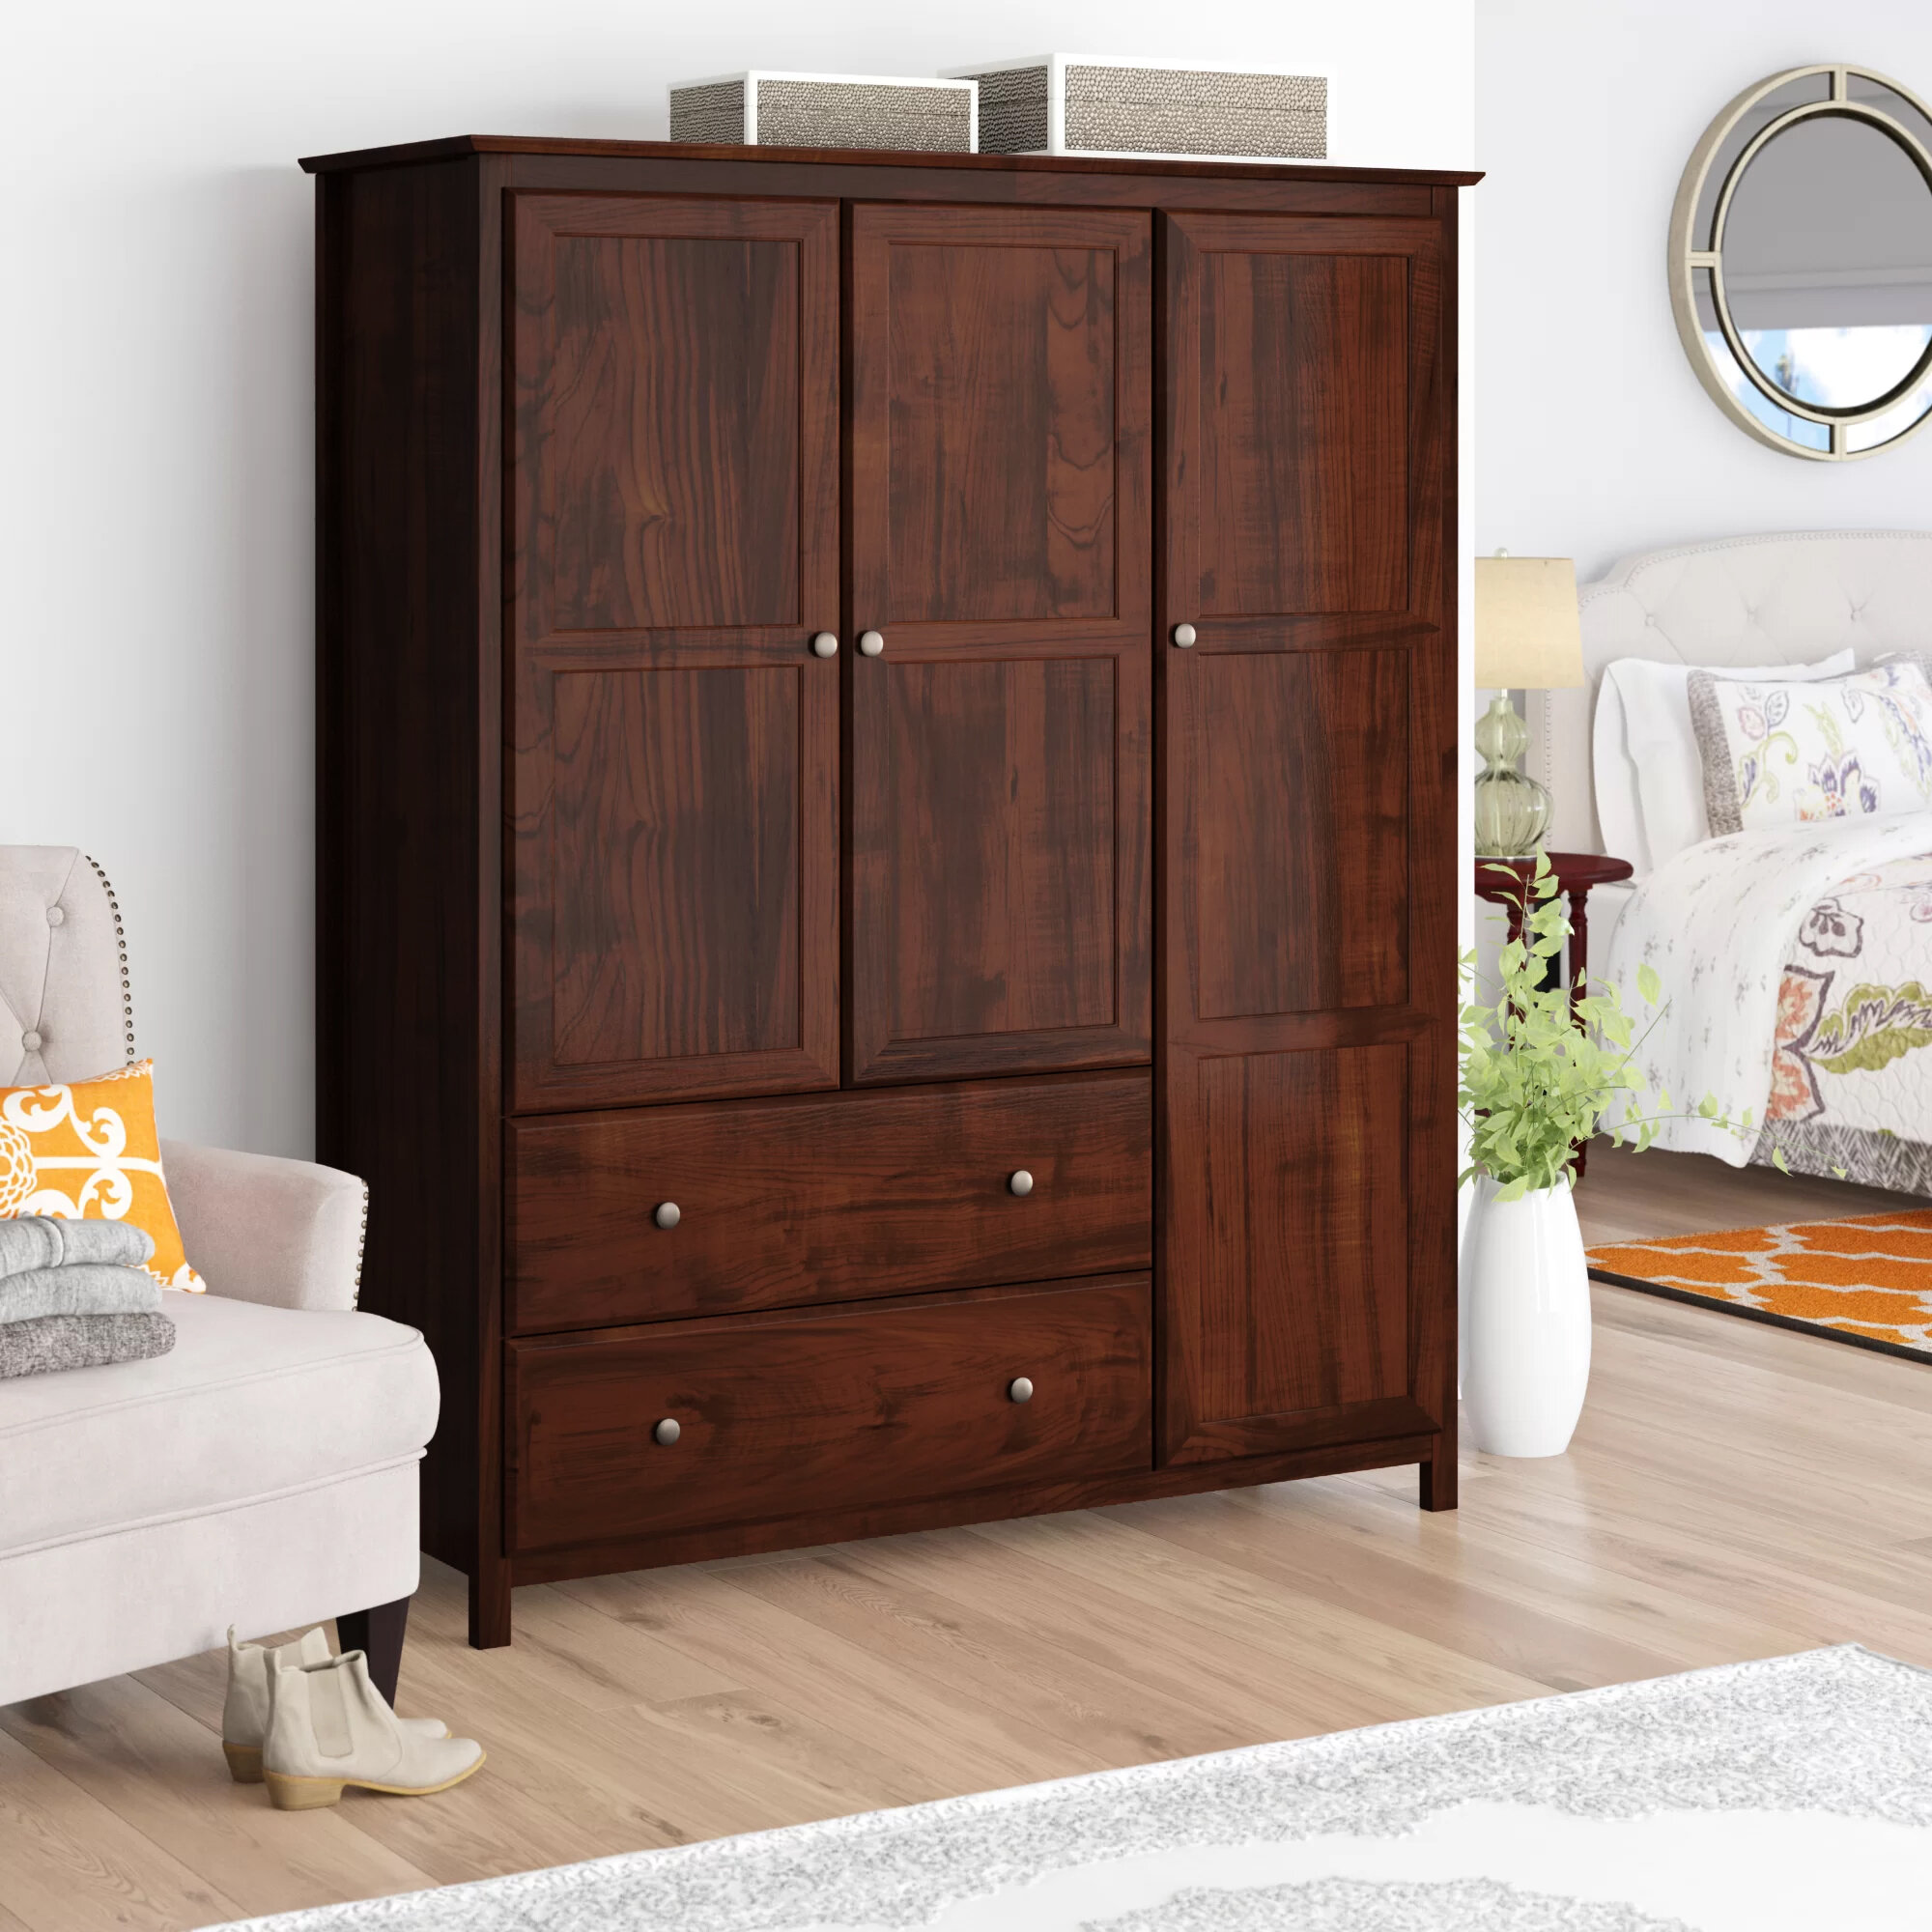 wood wardrobe closet for bedroom shelves hanging rod